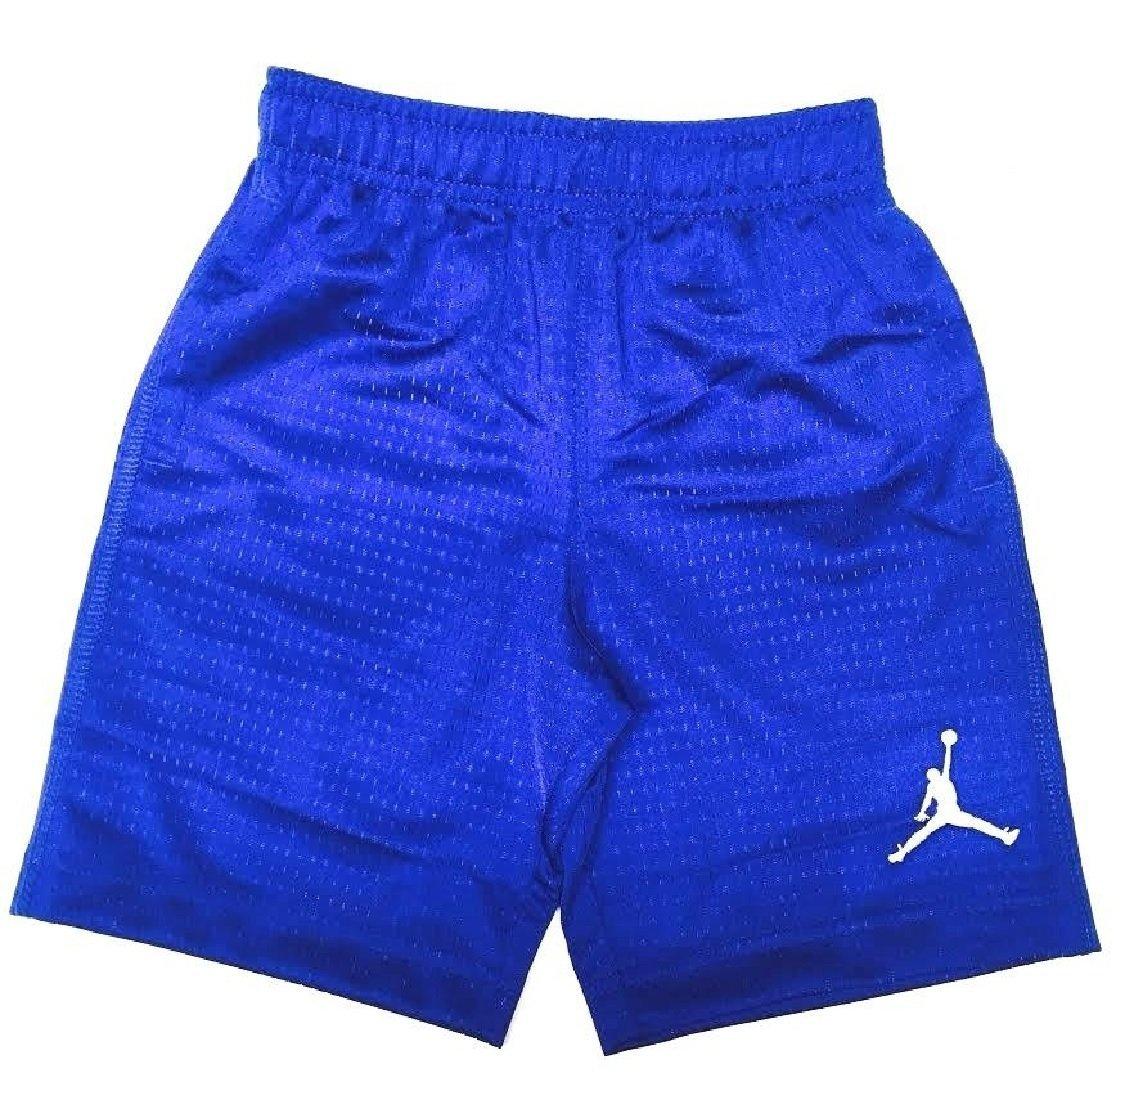 Nike Boy's Jordan Jumpman Mesh Basketball Shorts Size 4